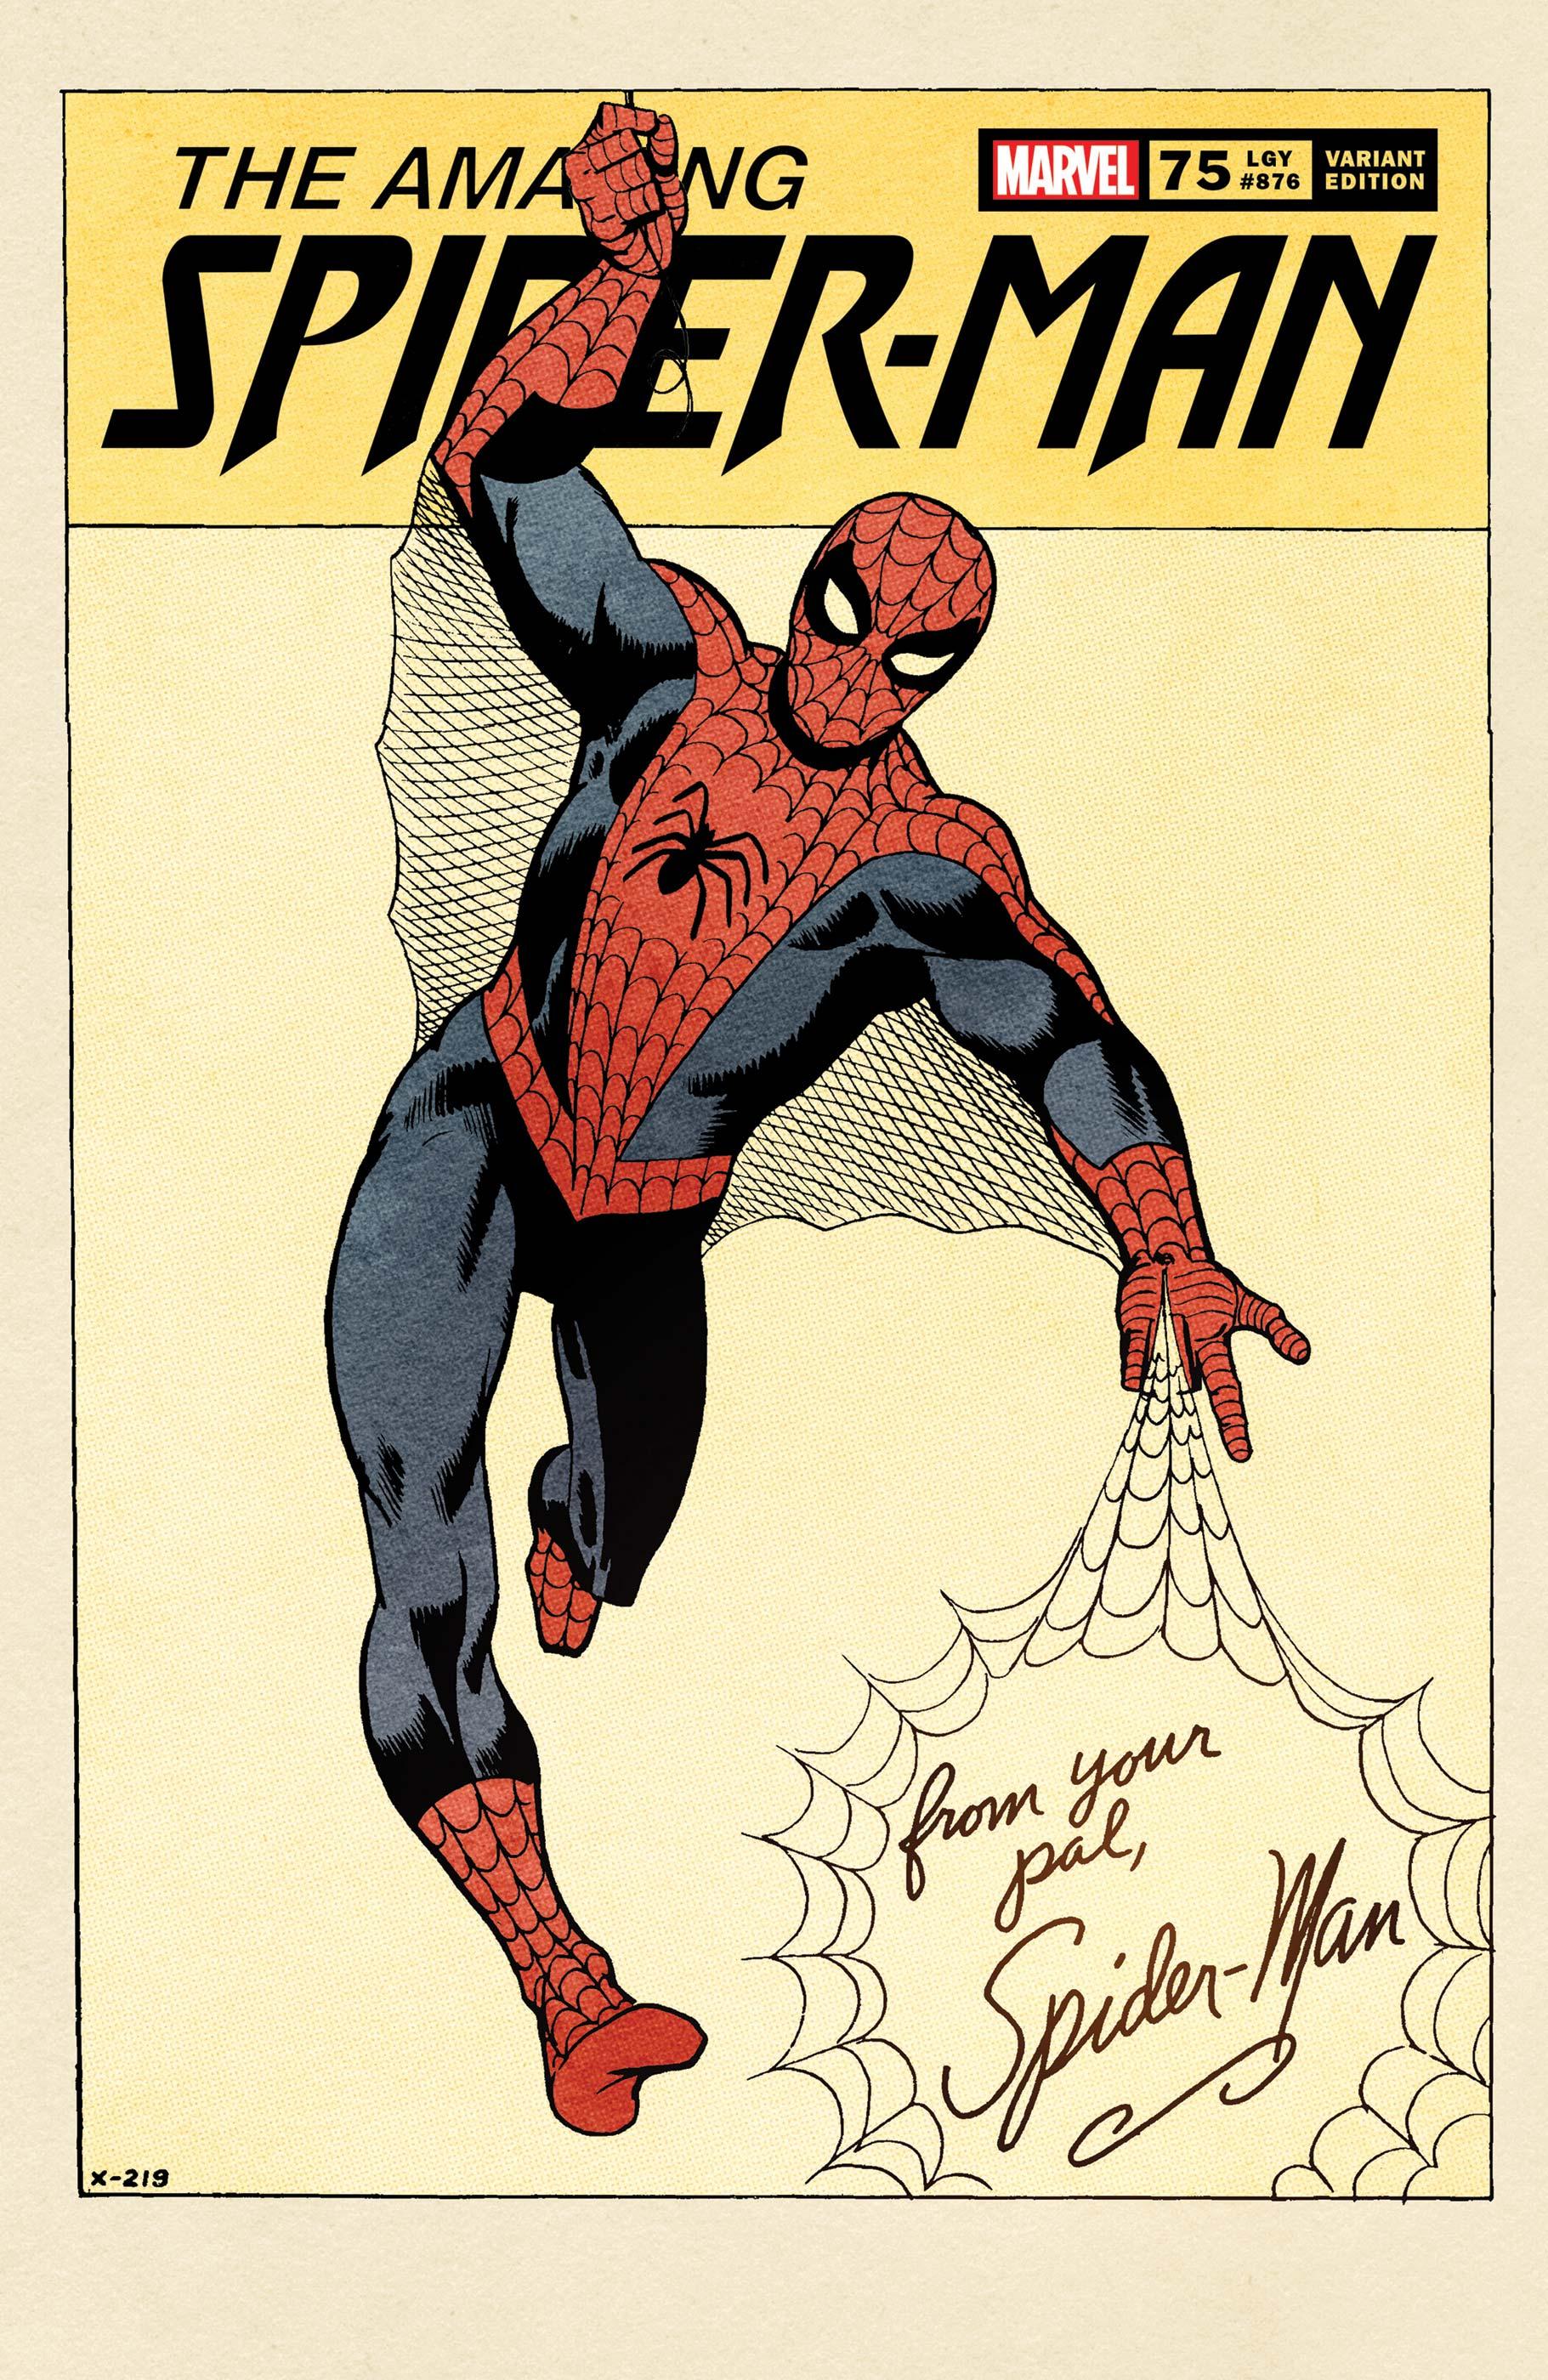 The Amazing Spider-Man (2018) #75 (Variant)